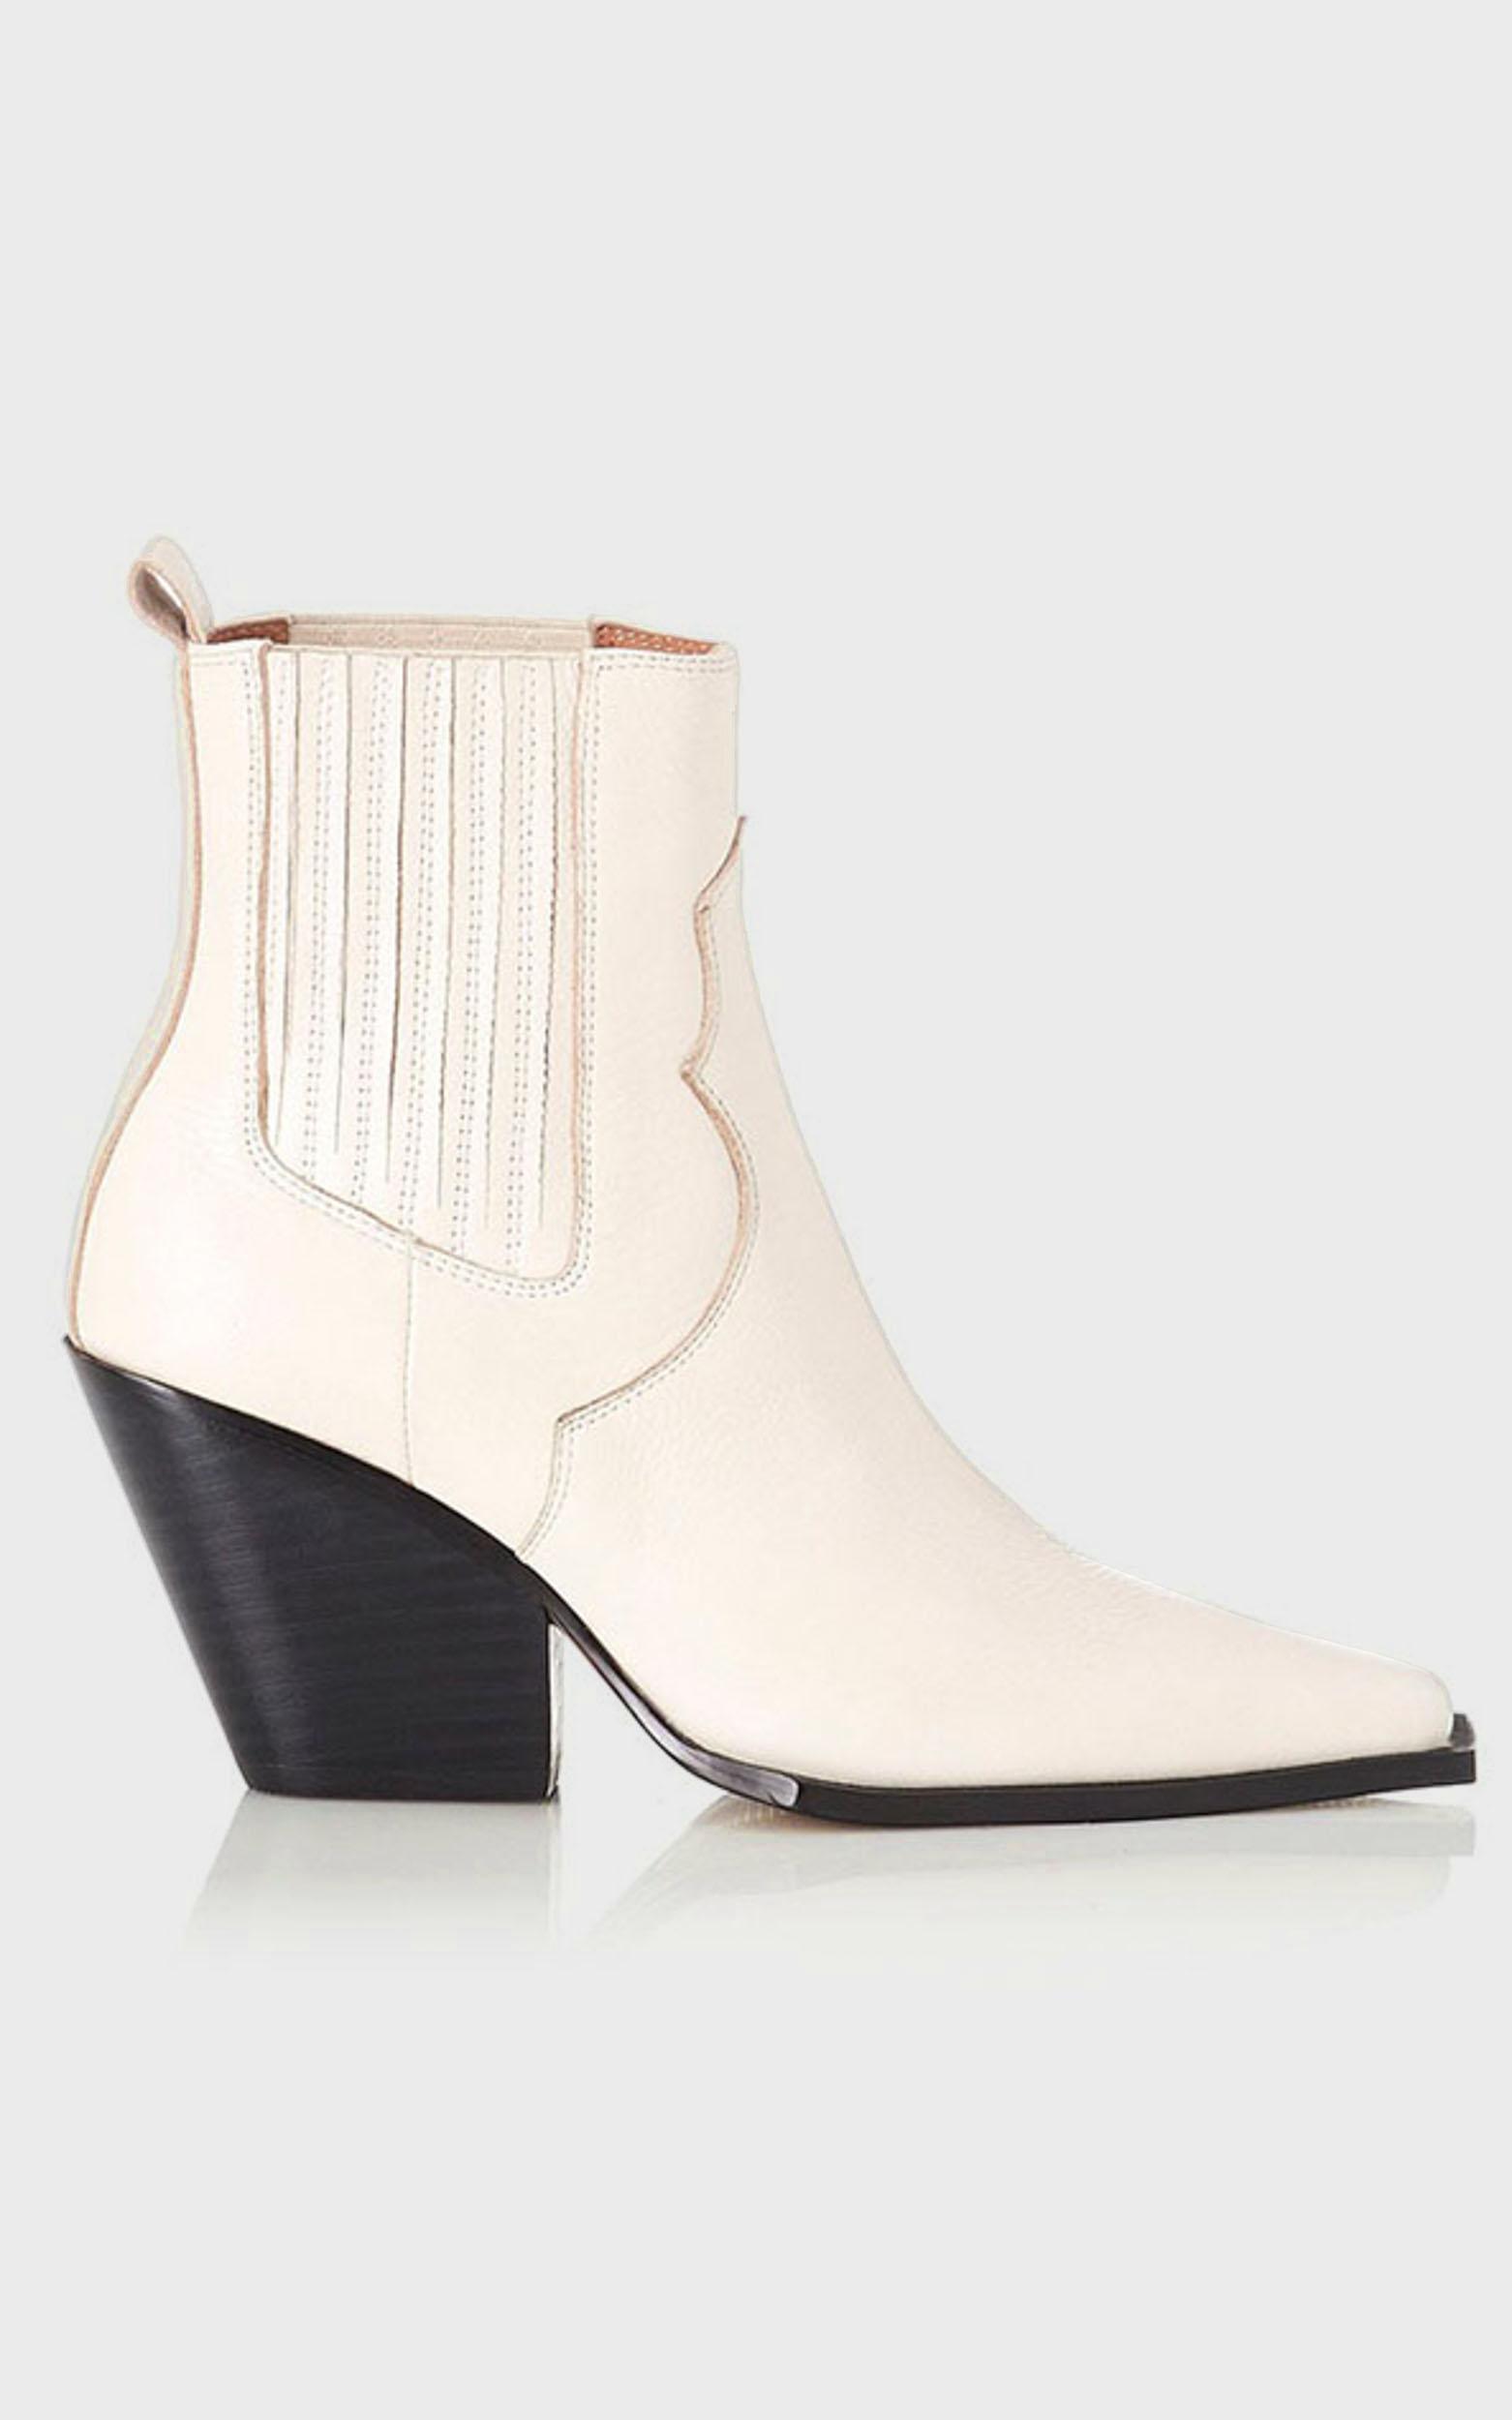 Alias Mae - Belle Boots in Bone Leather - 5.5, Cream, hi-res image number null